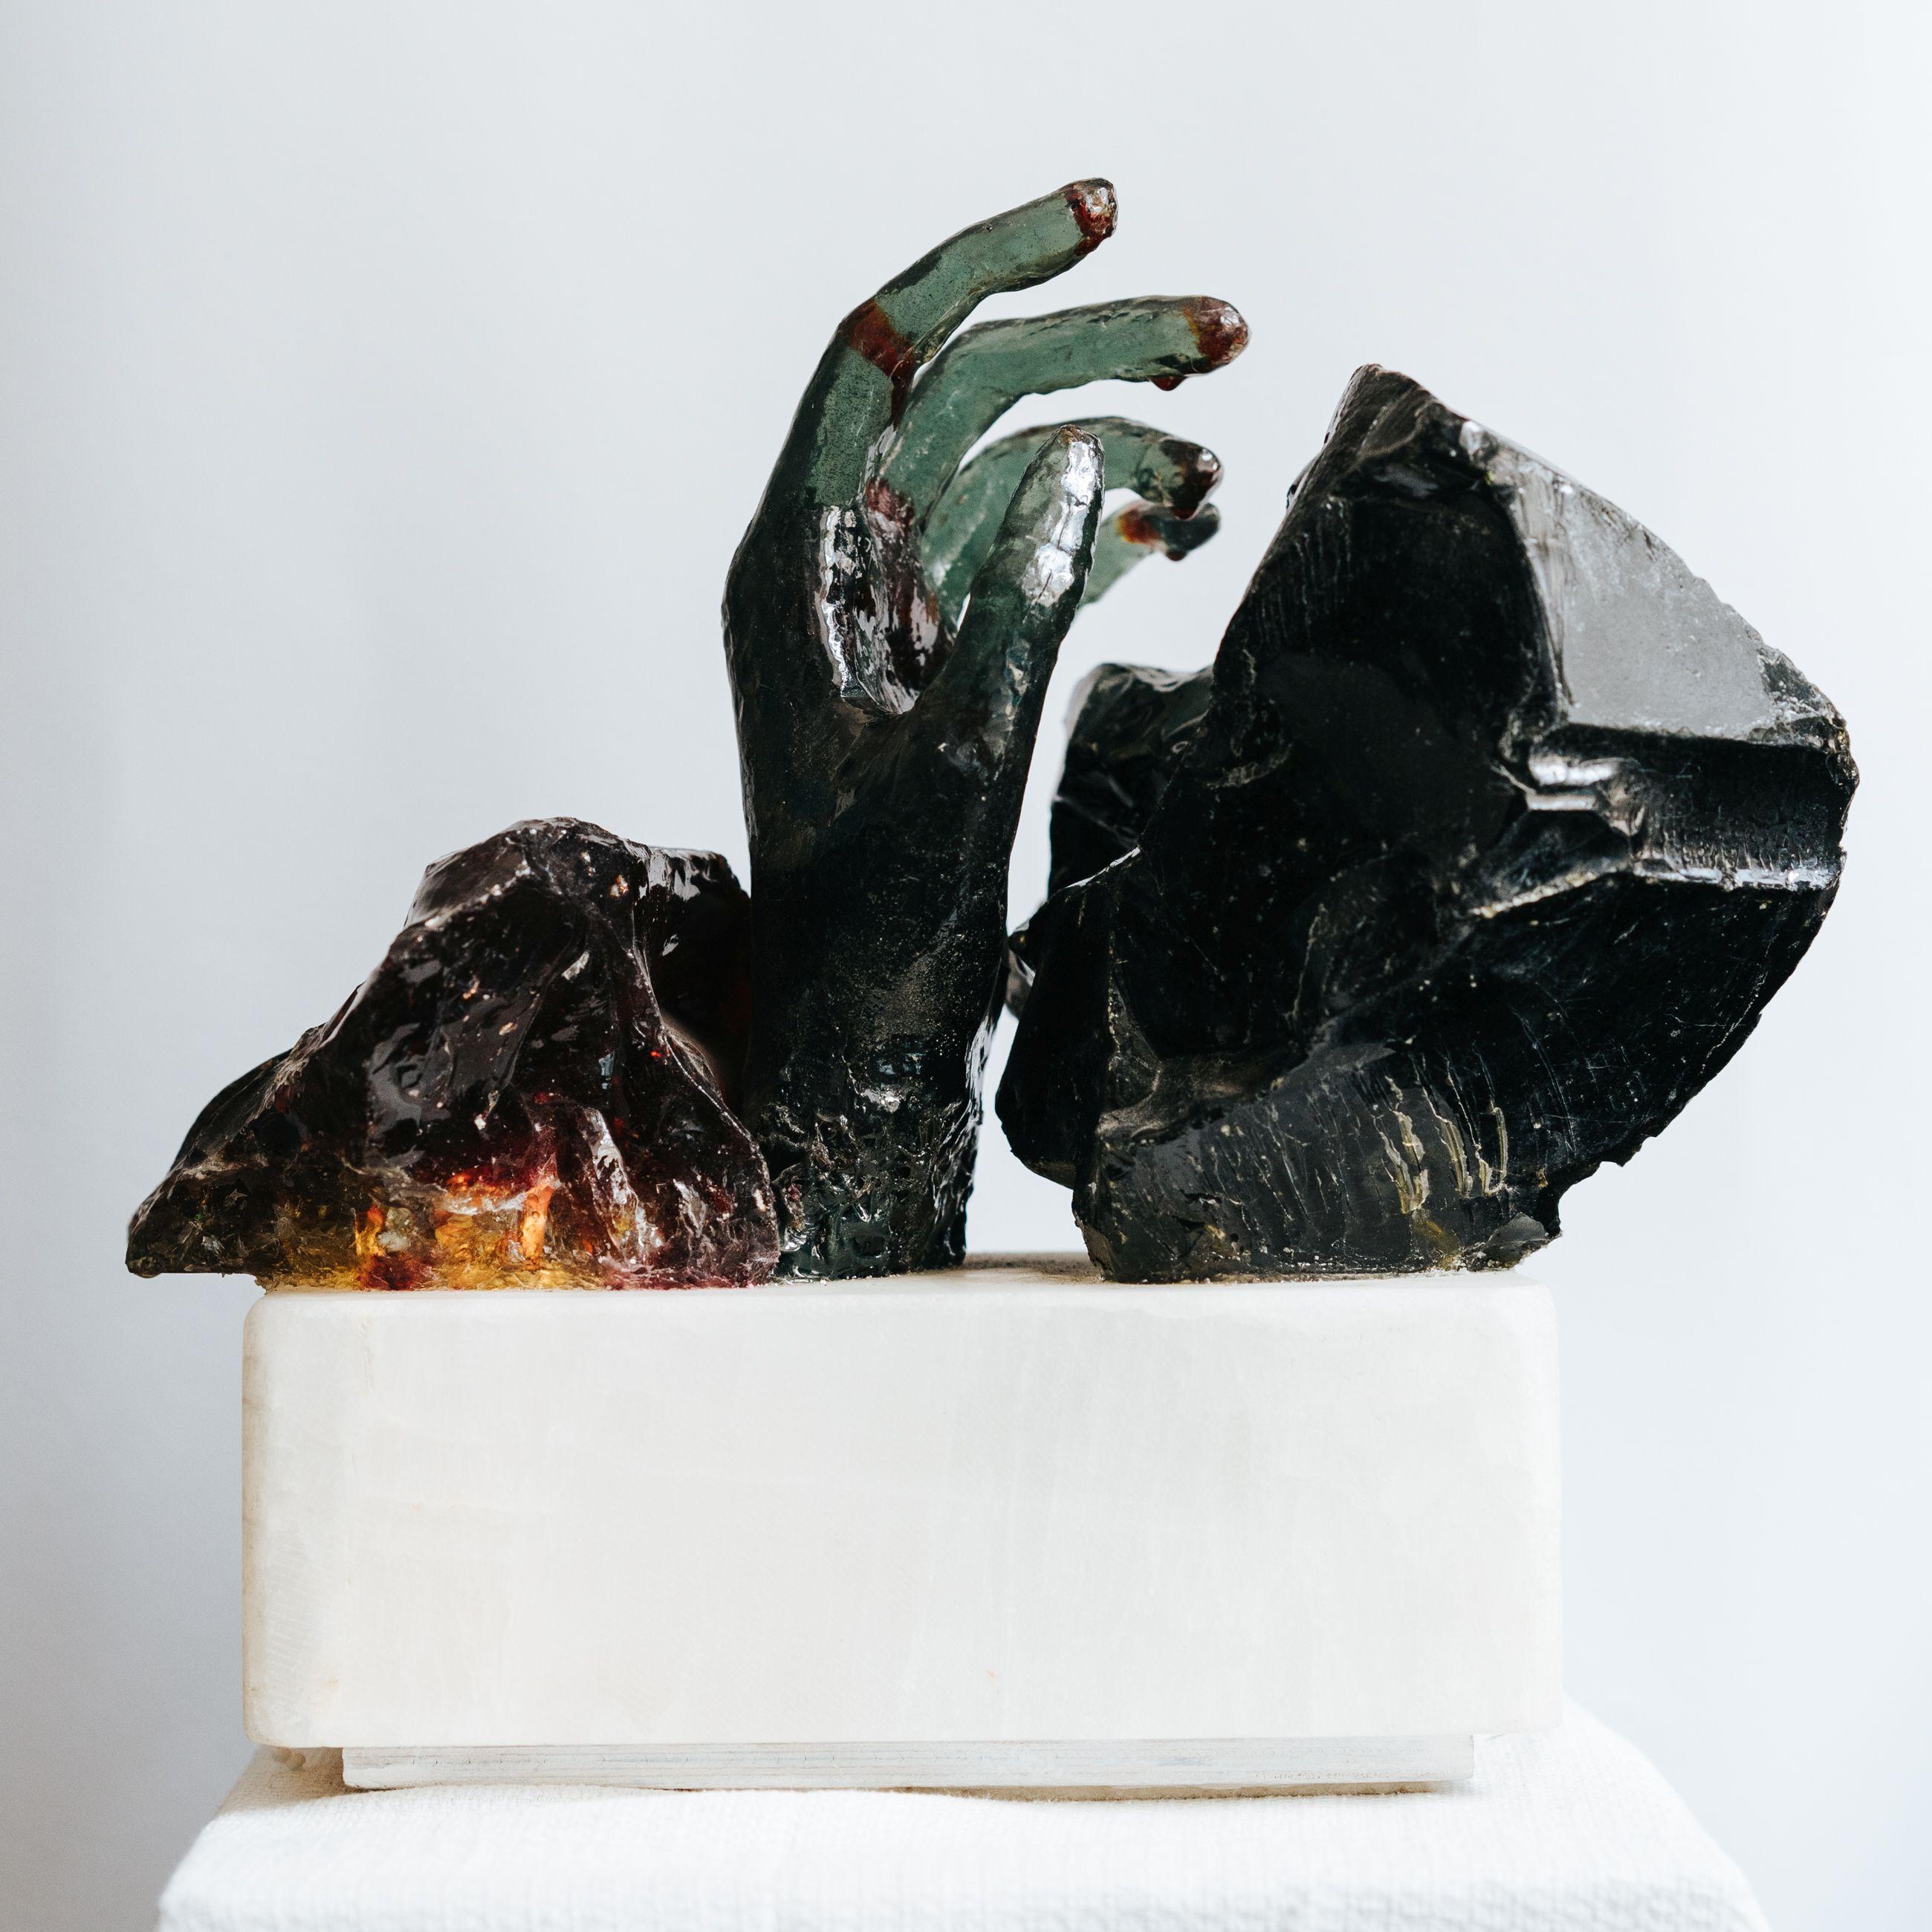 Rzeźba ETIUDA op. 25 Nr 1 FRYDERYKA CHOPINA, 2018